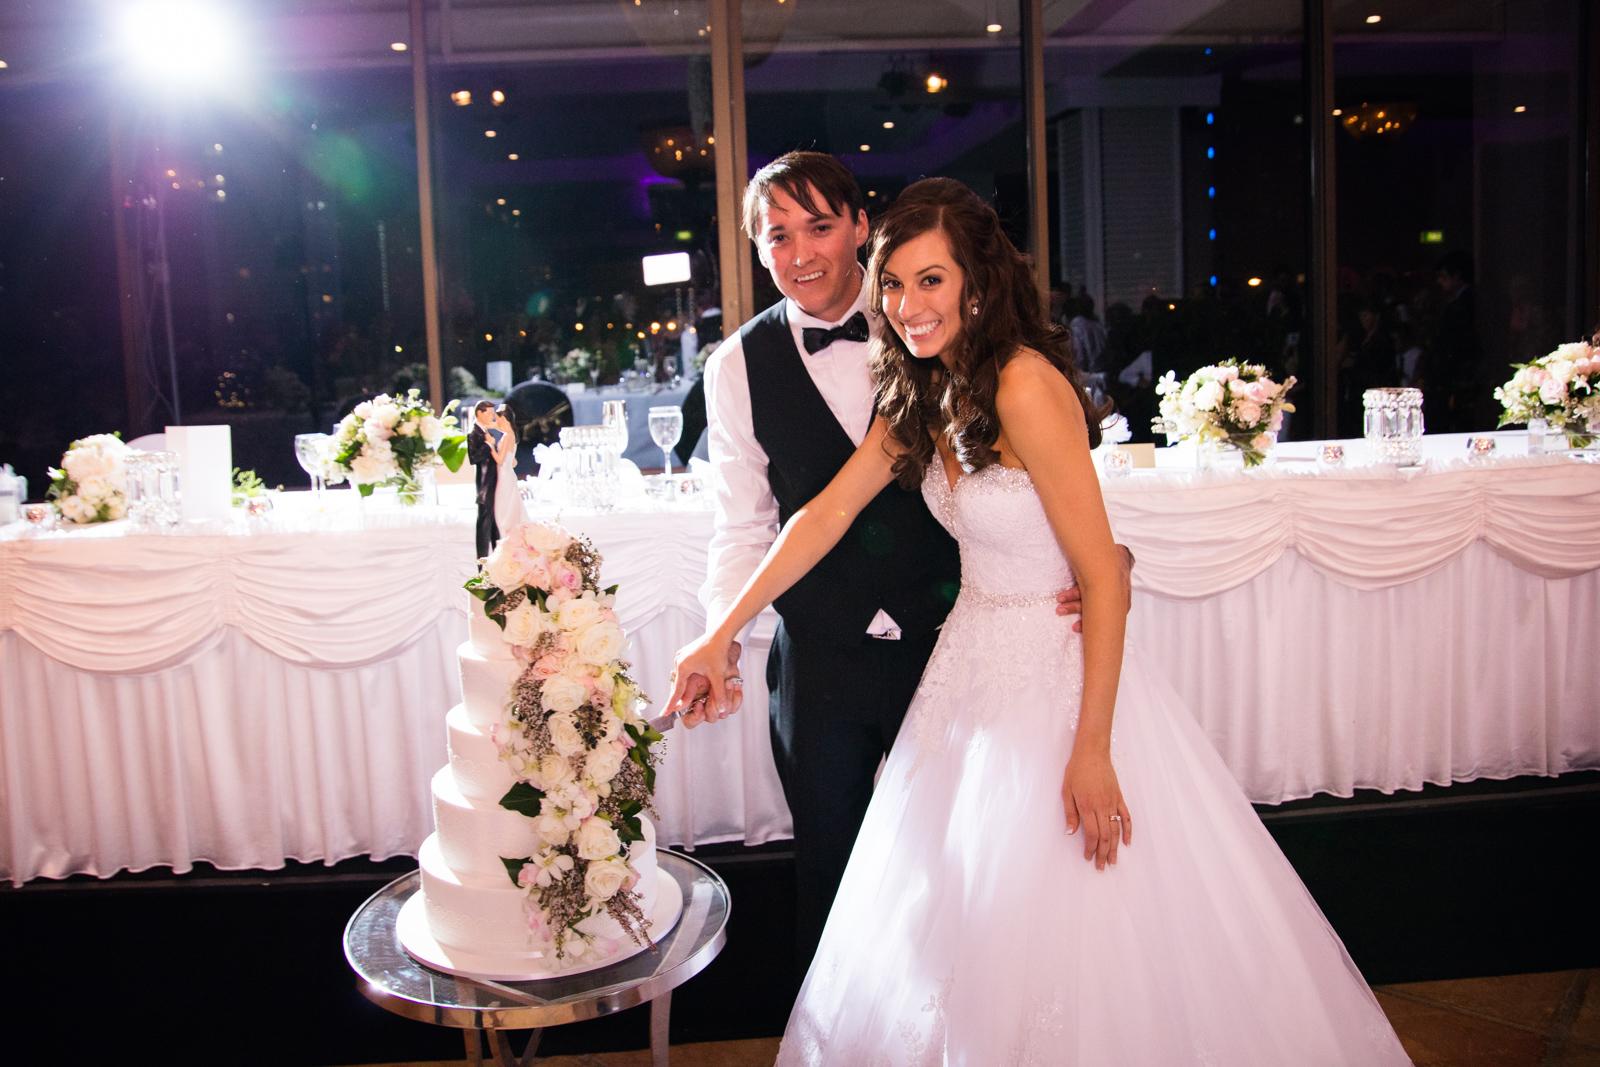 Tory & Bianca's Wedding cake